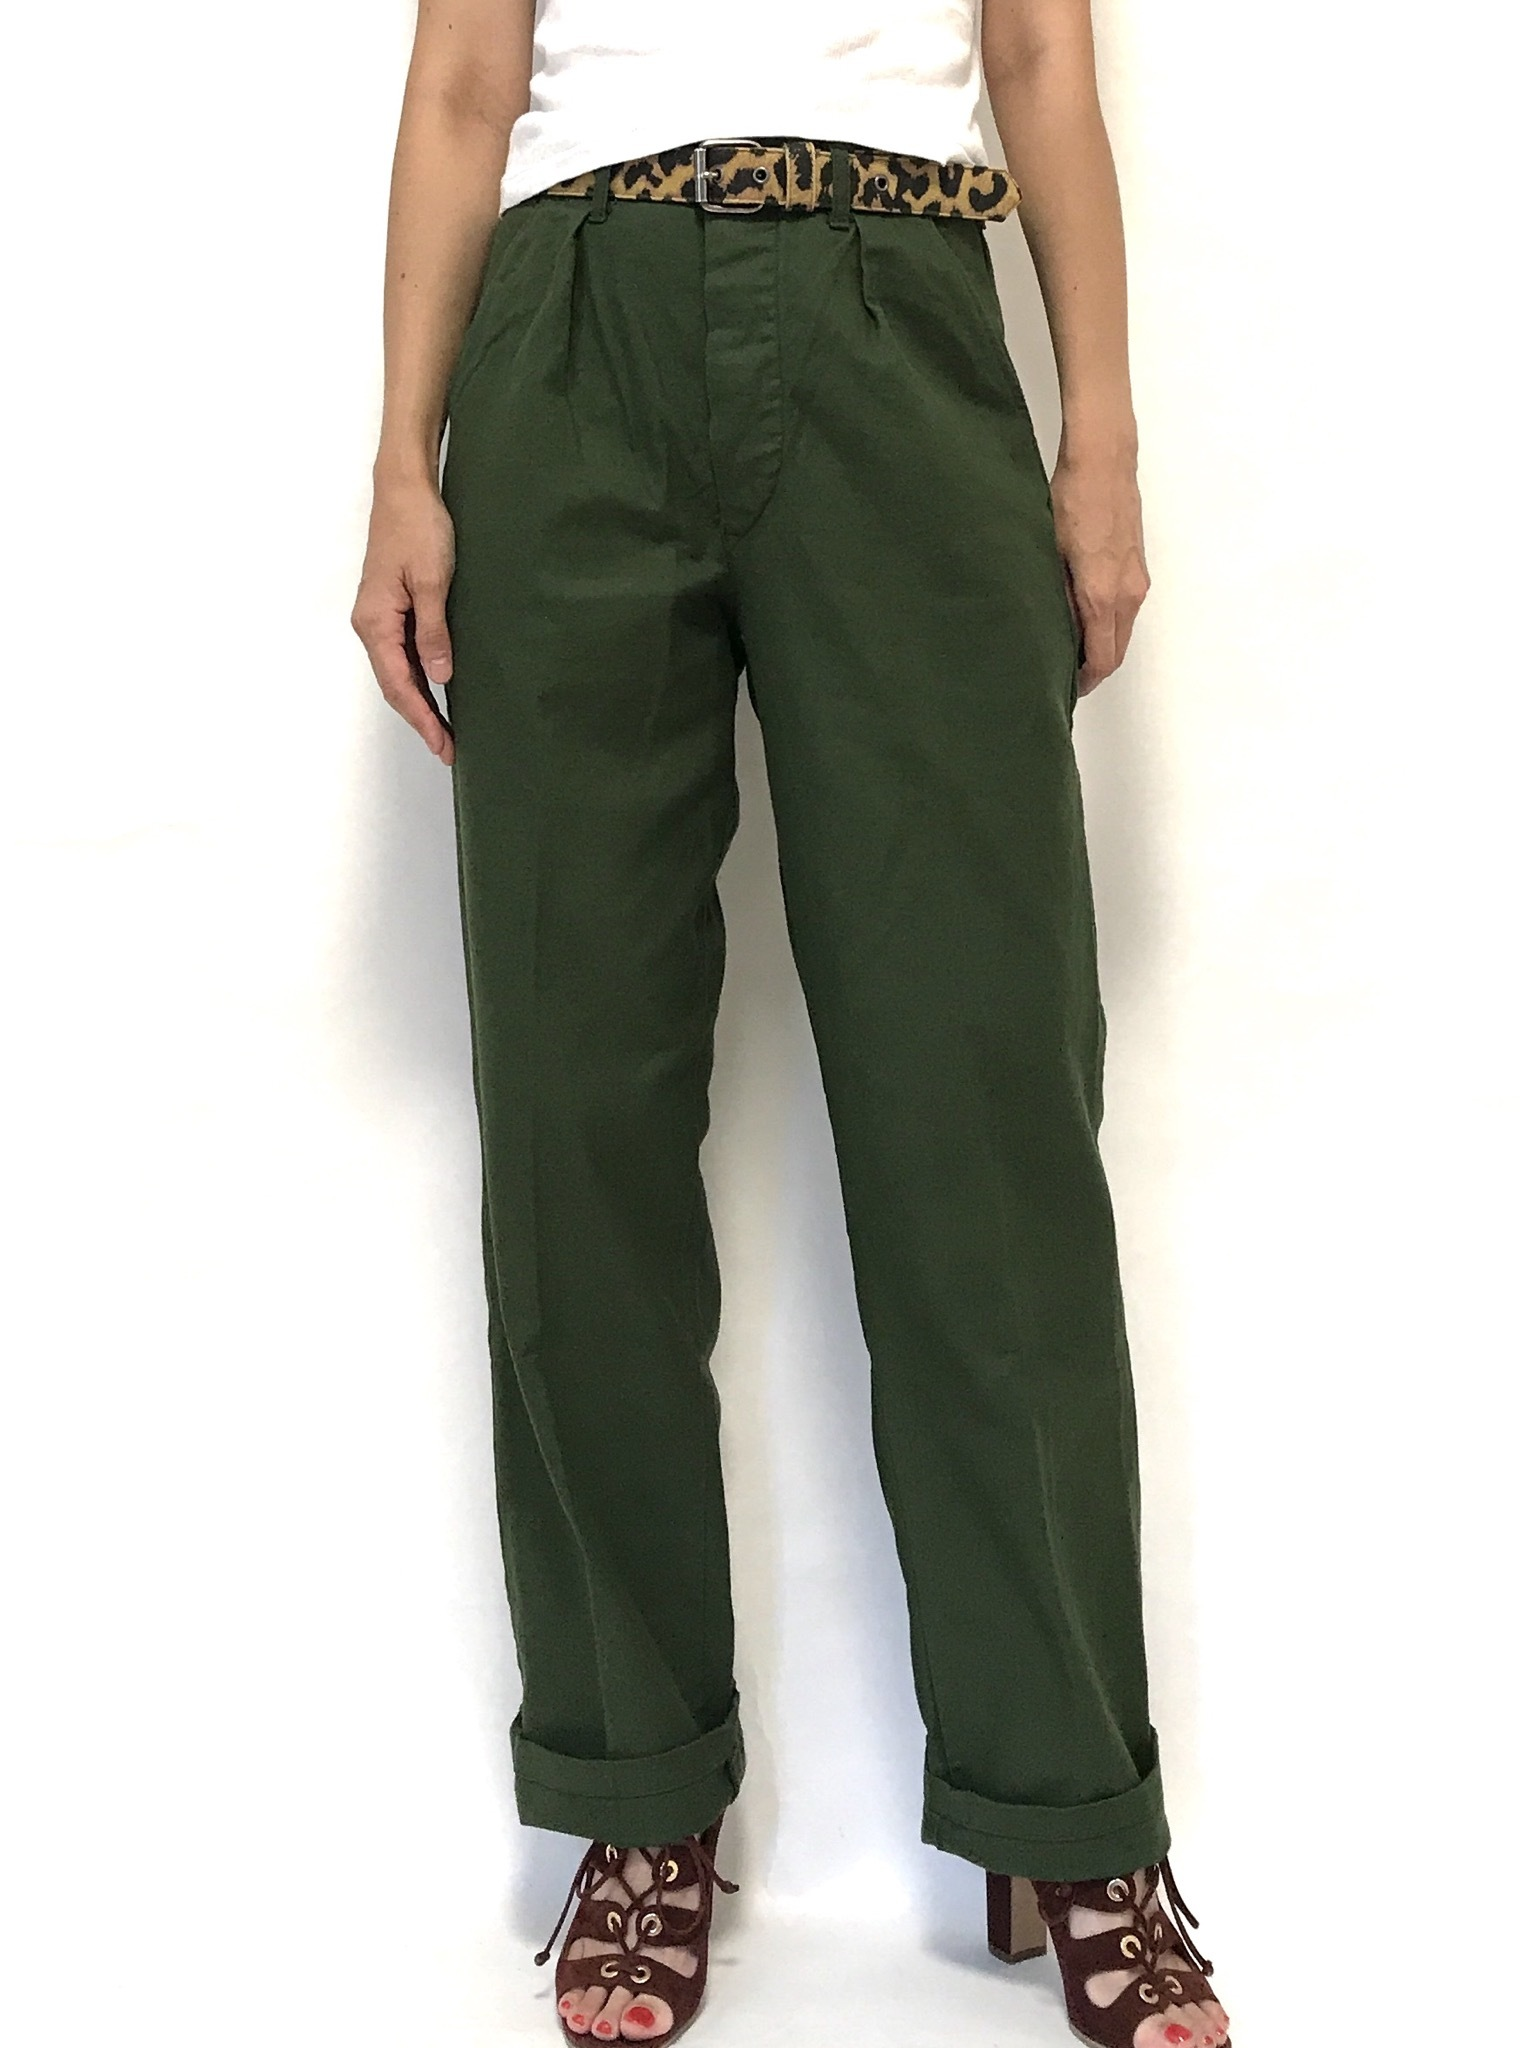 ⑤ 80's Swedish Army Utility Pants C44